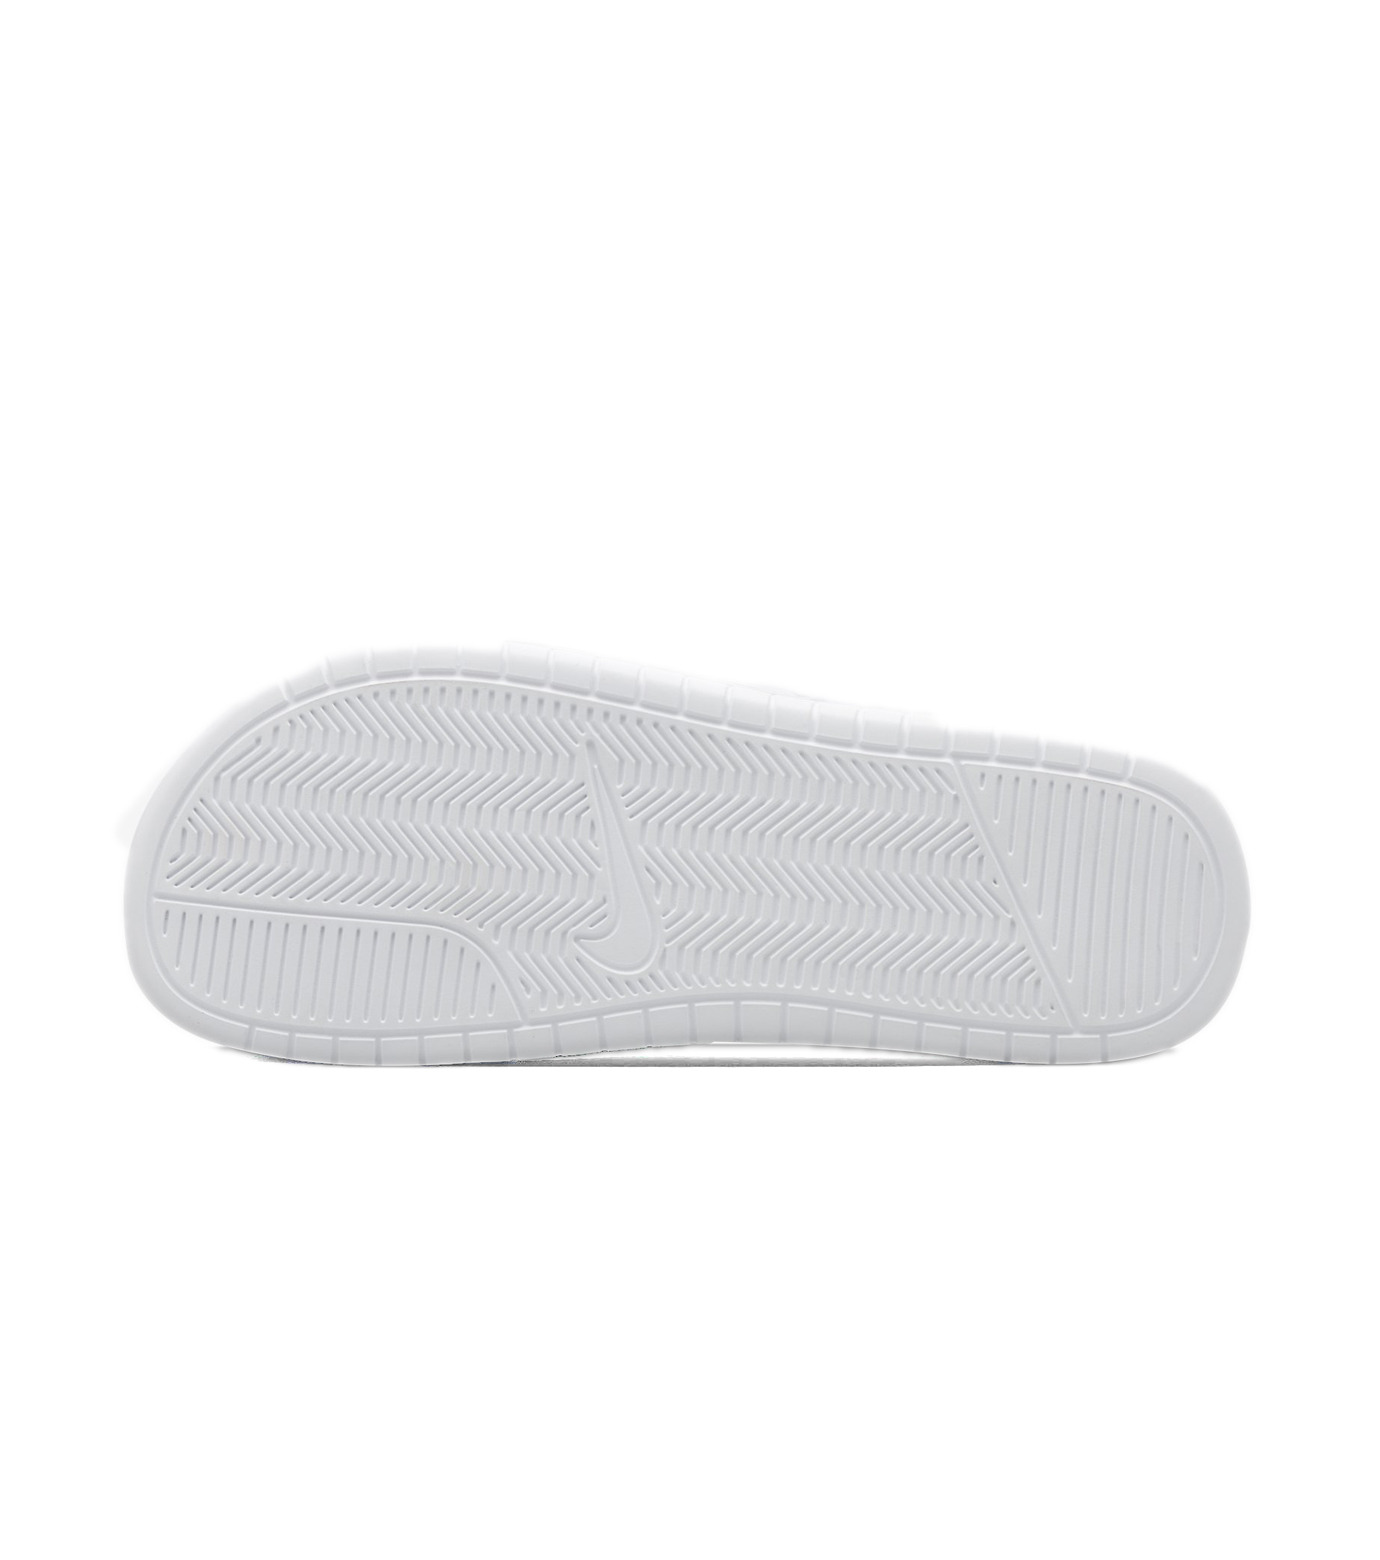 NIKE(ナイキ)のBenassi CUFF-WHITE(シューズ/shoes)-819684-100-4 拡大詳細画像2